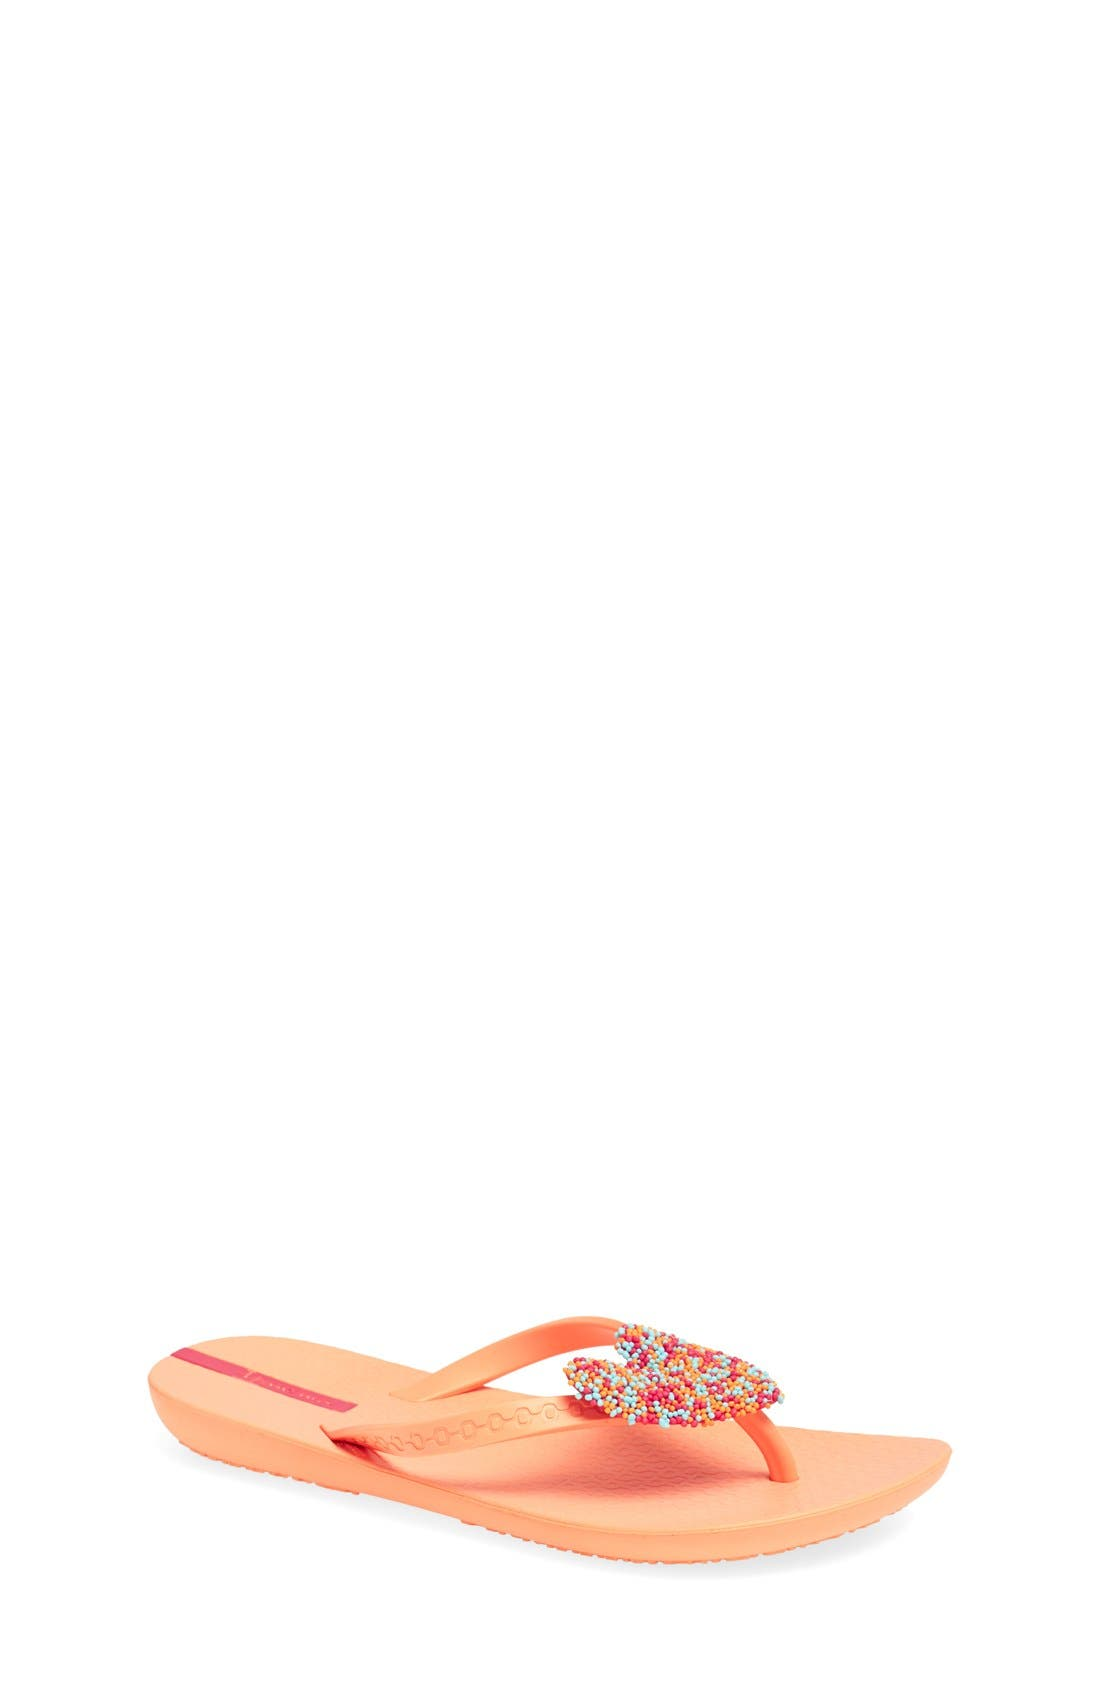 Main Image - Ipanema 'Summer Love' Flip Flop (Toddler & Little Kid)